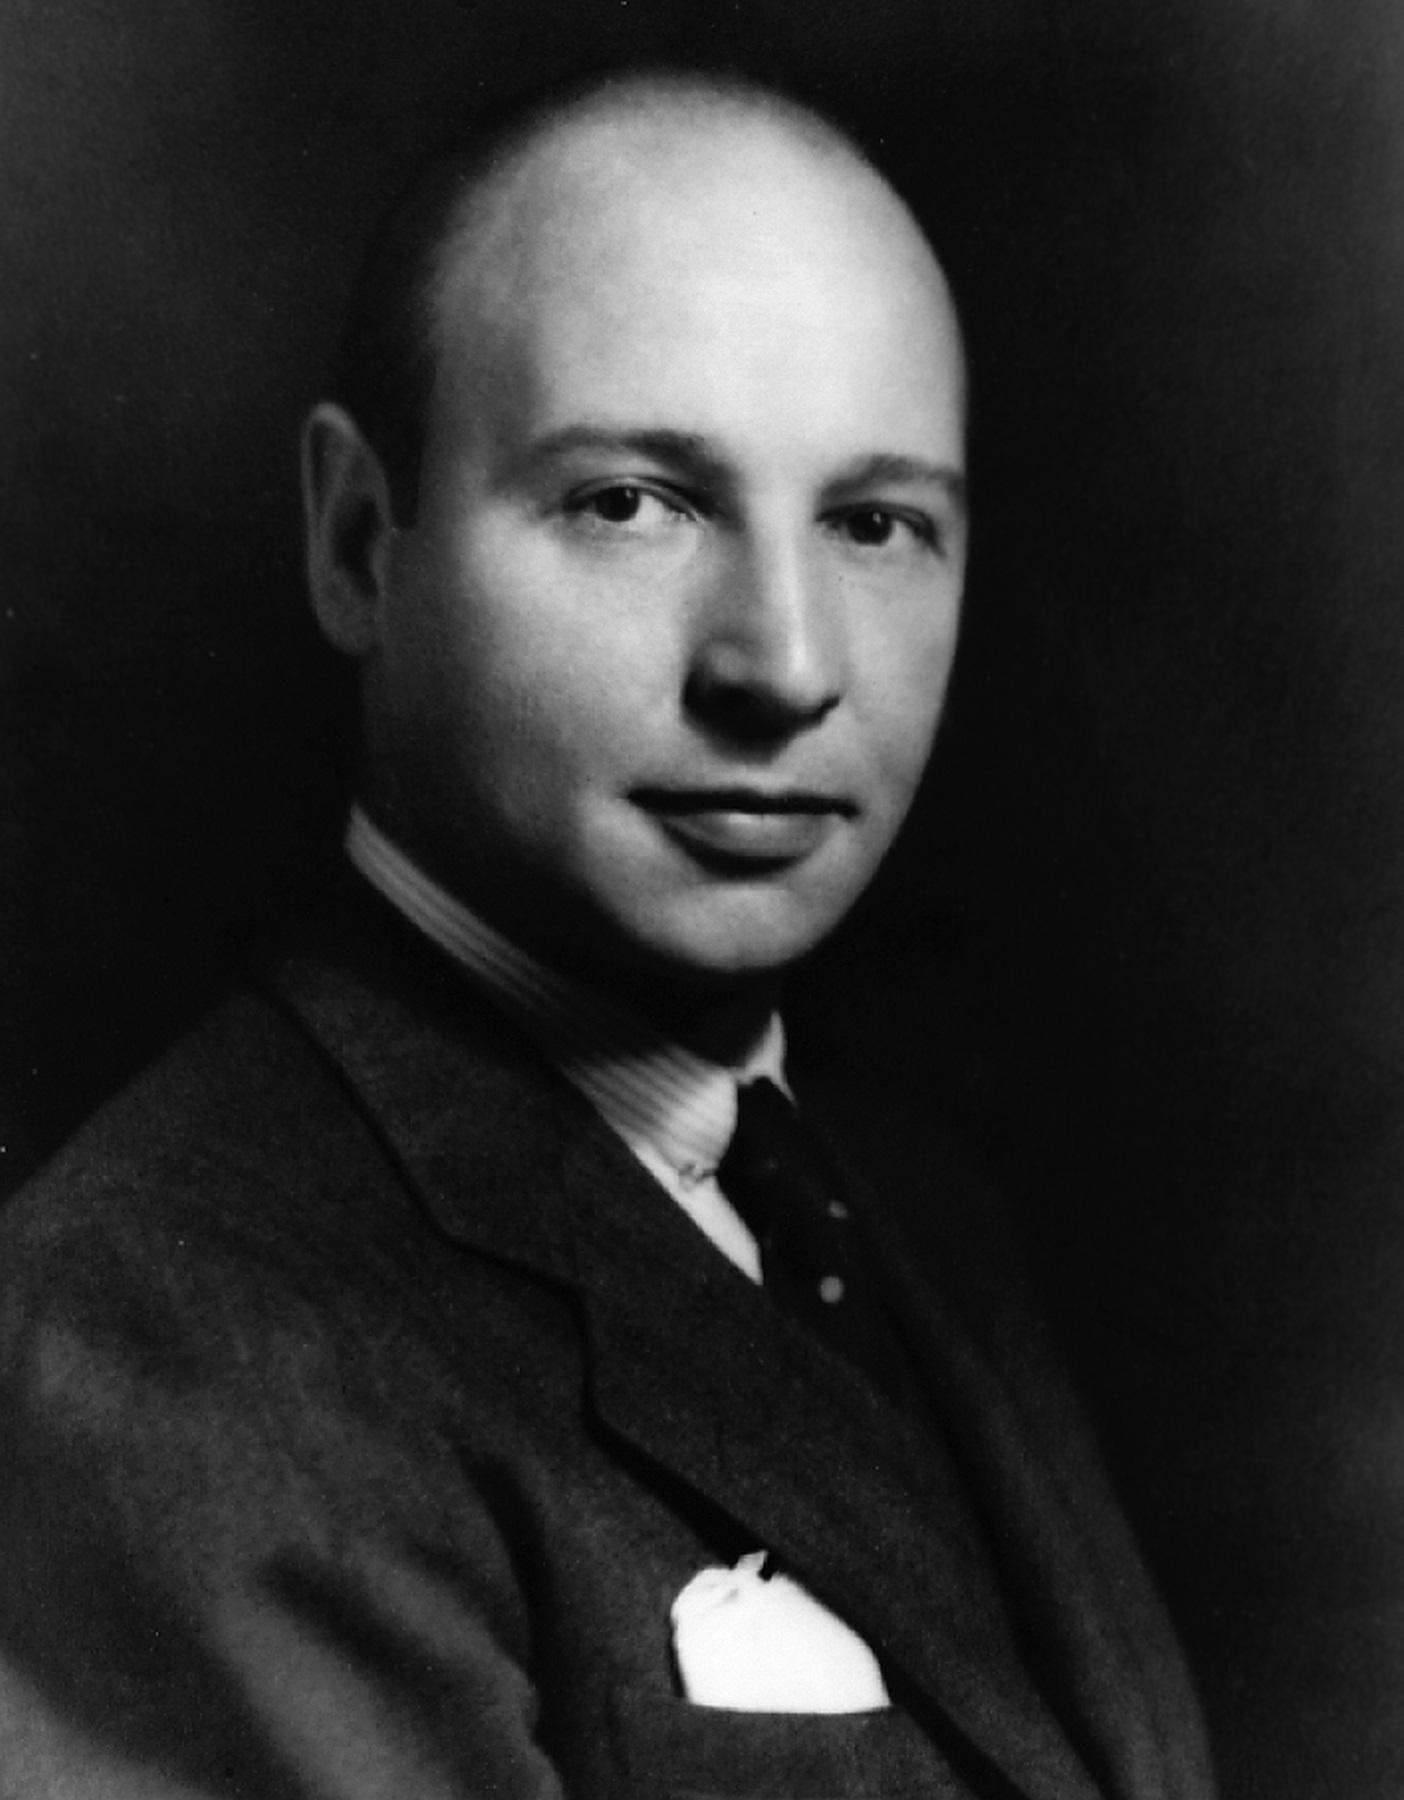 David J. Brunn